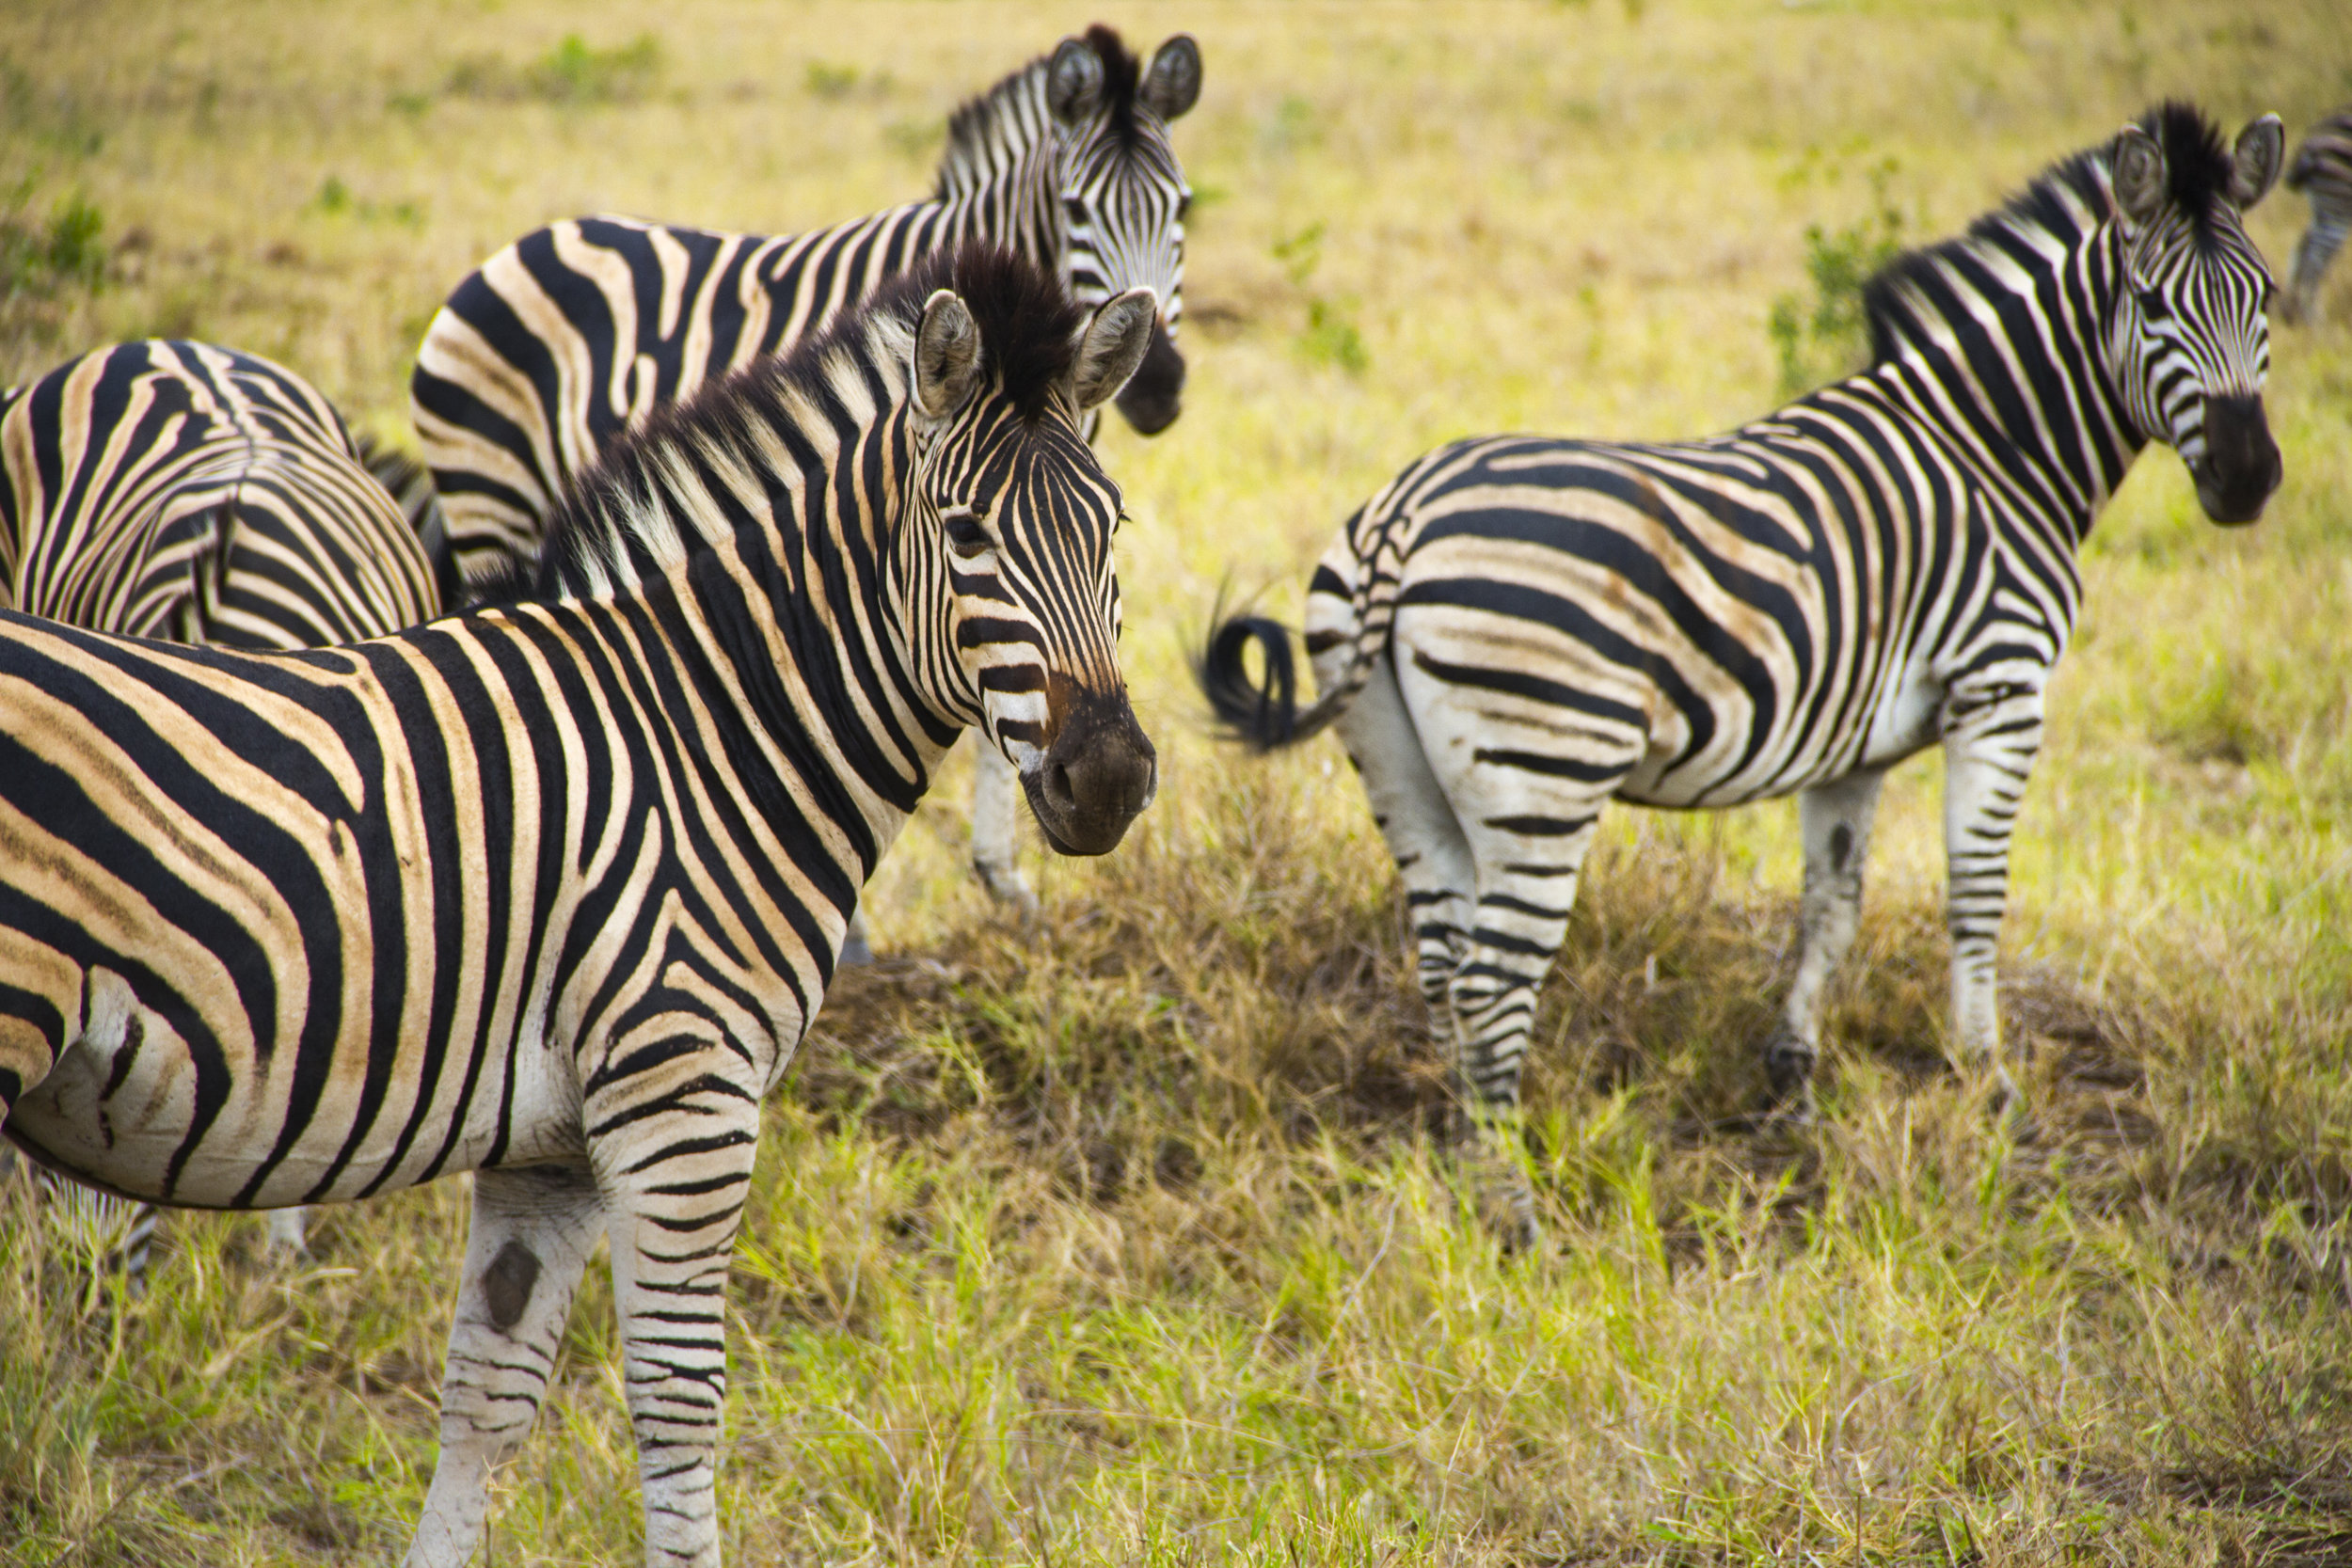 SouthAfrica_sm-3786.jpg